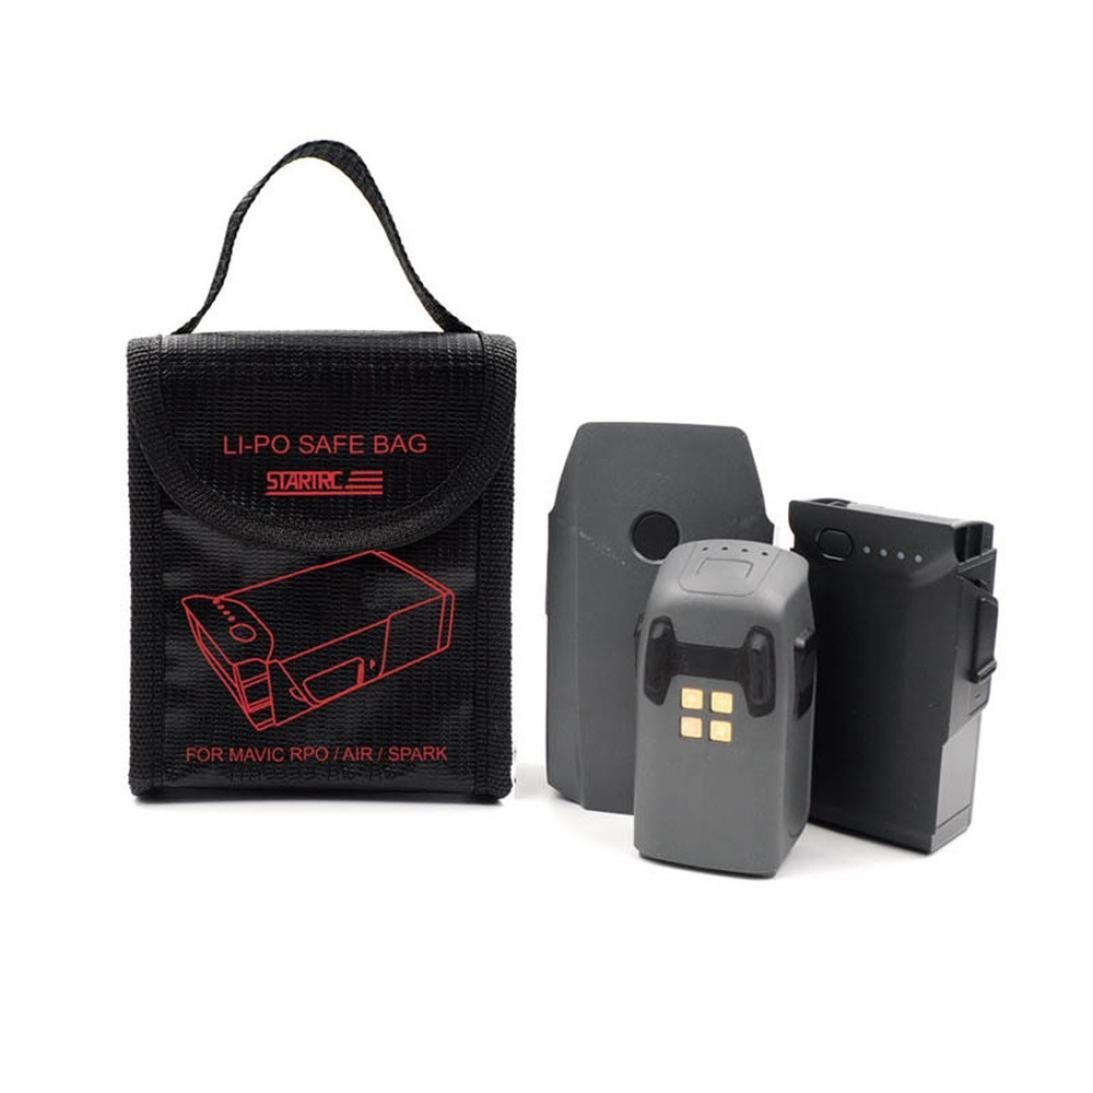 Sikye LI-PO Explosion-proof Fireproof Safe Bag Cover Batteries Storage for DJI Mavic Series/Spark